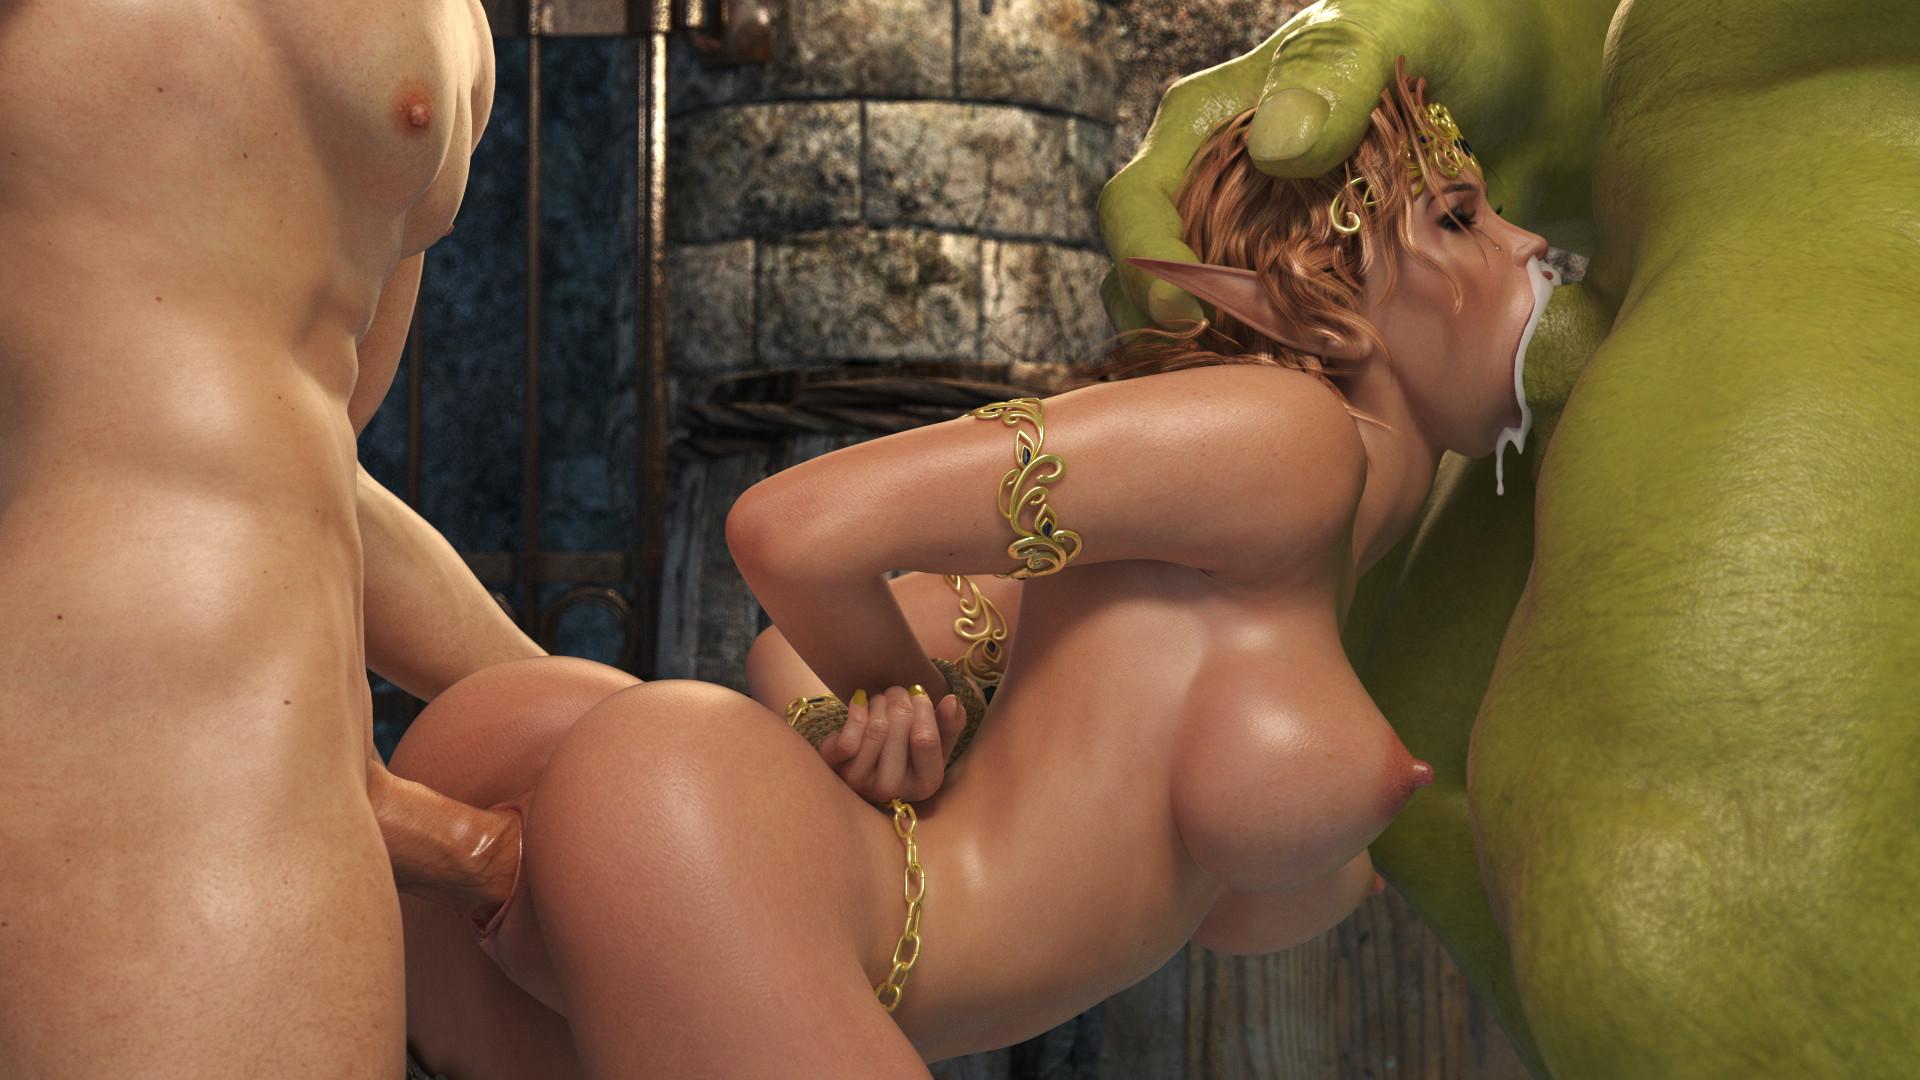 Fantasy Sex With Neigbor Young Wife Sora Aoi Photo